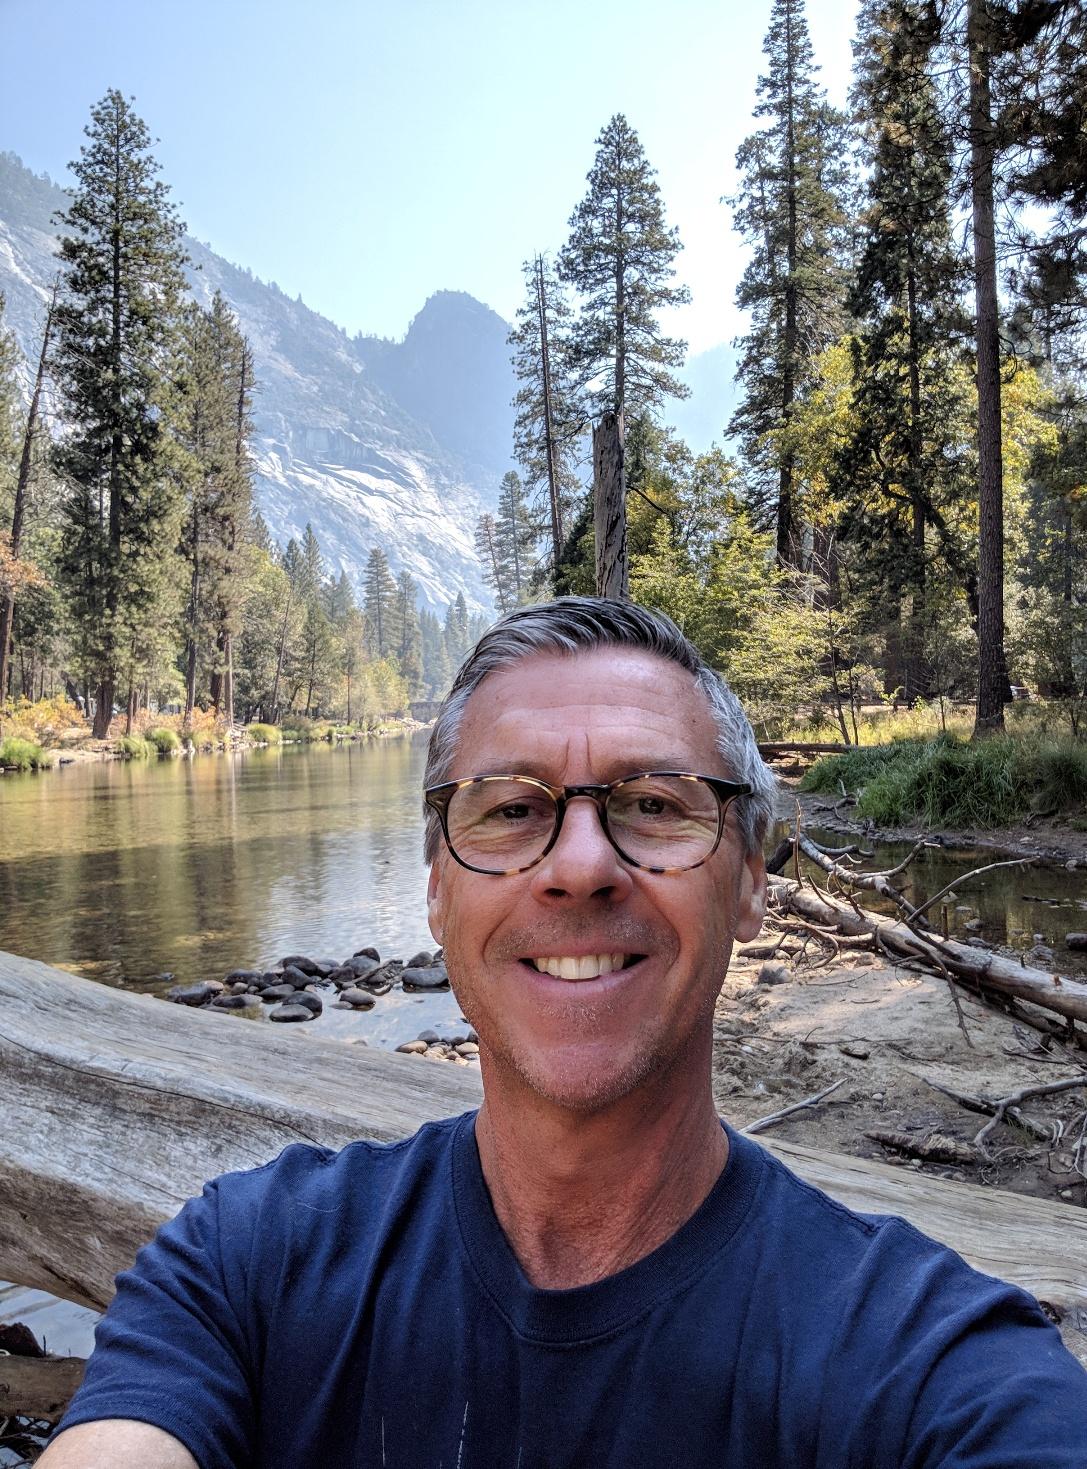 Yosemite Valley river